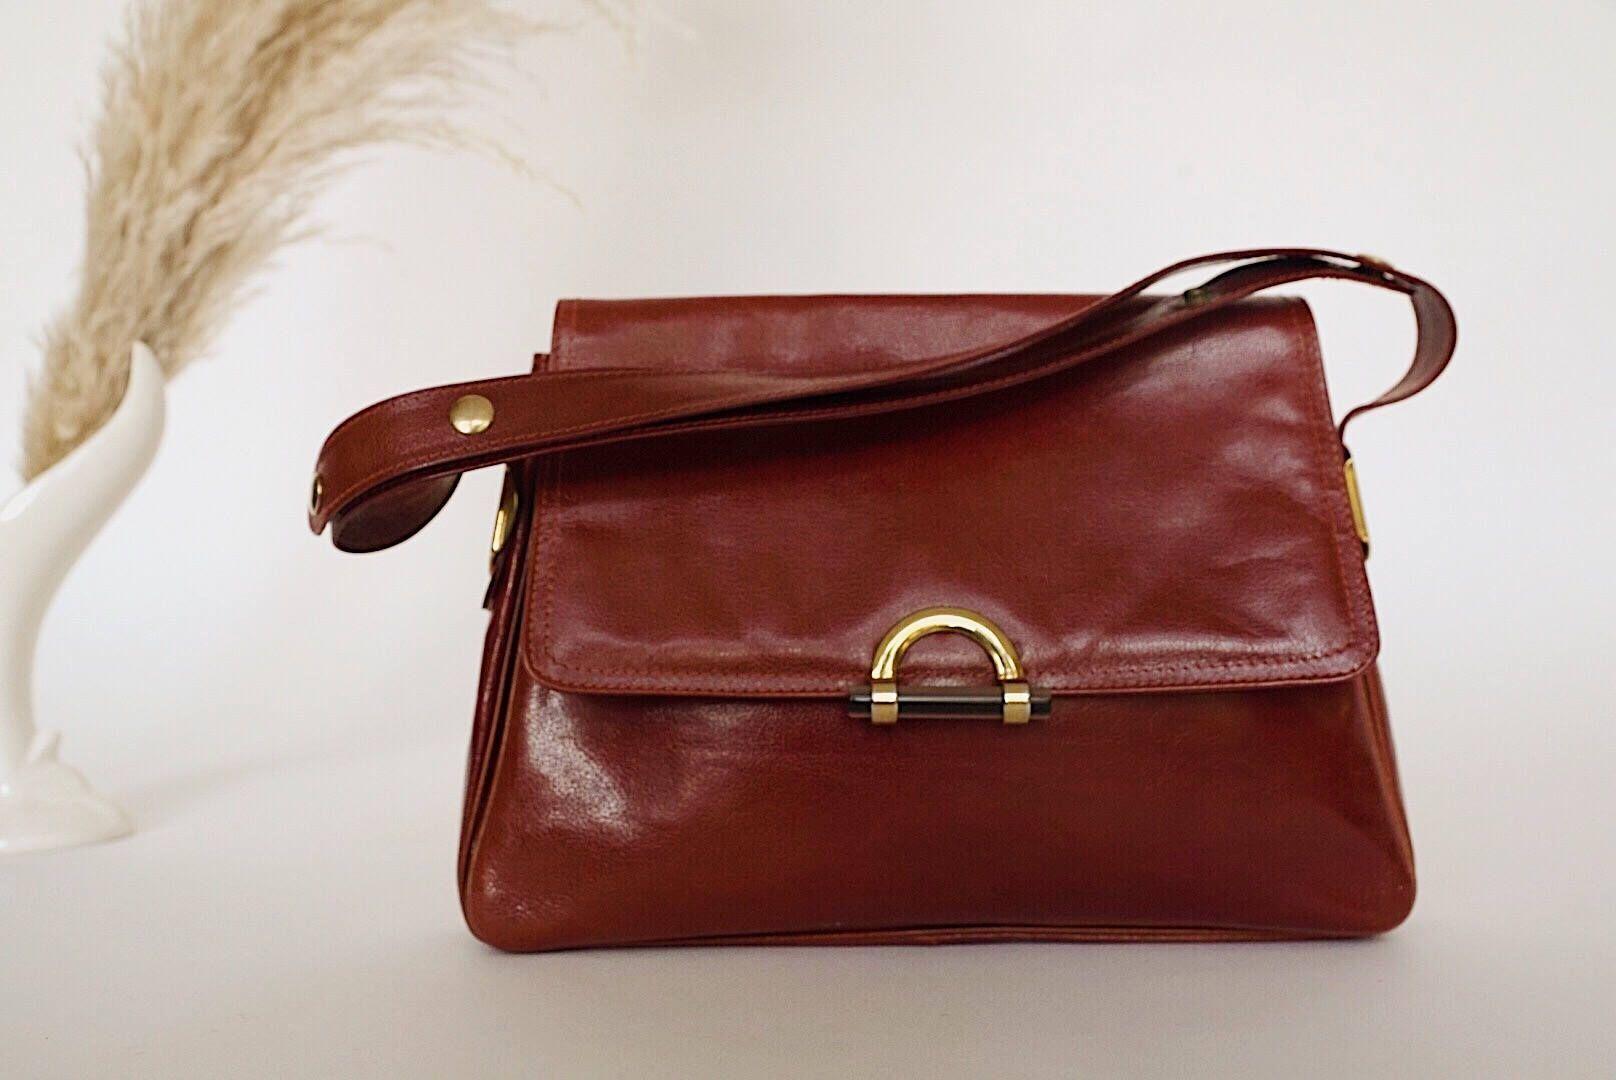 70 s Mantessa bag  Italian leather bag leather bags everyday bag leather  bags be7dd59efa5d1